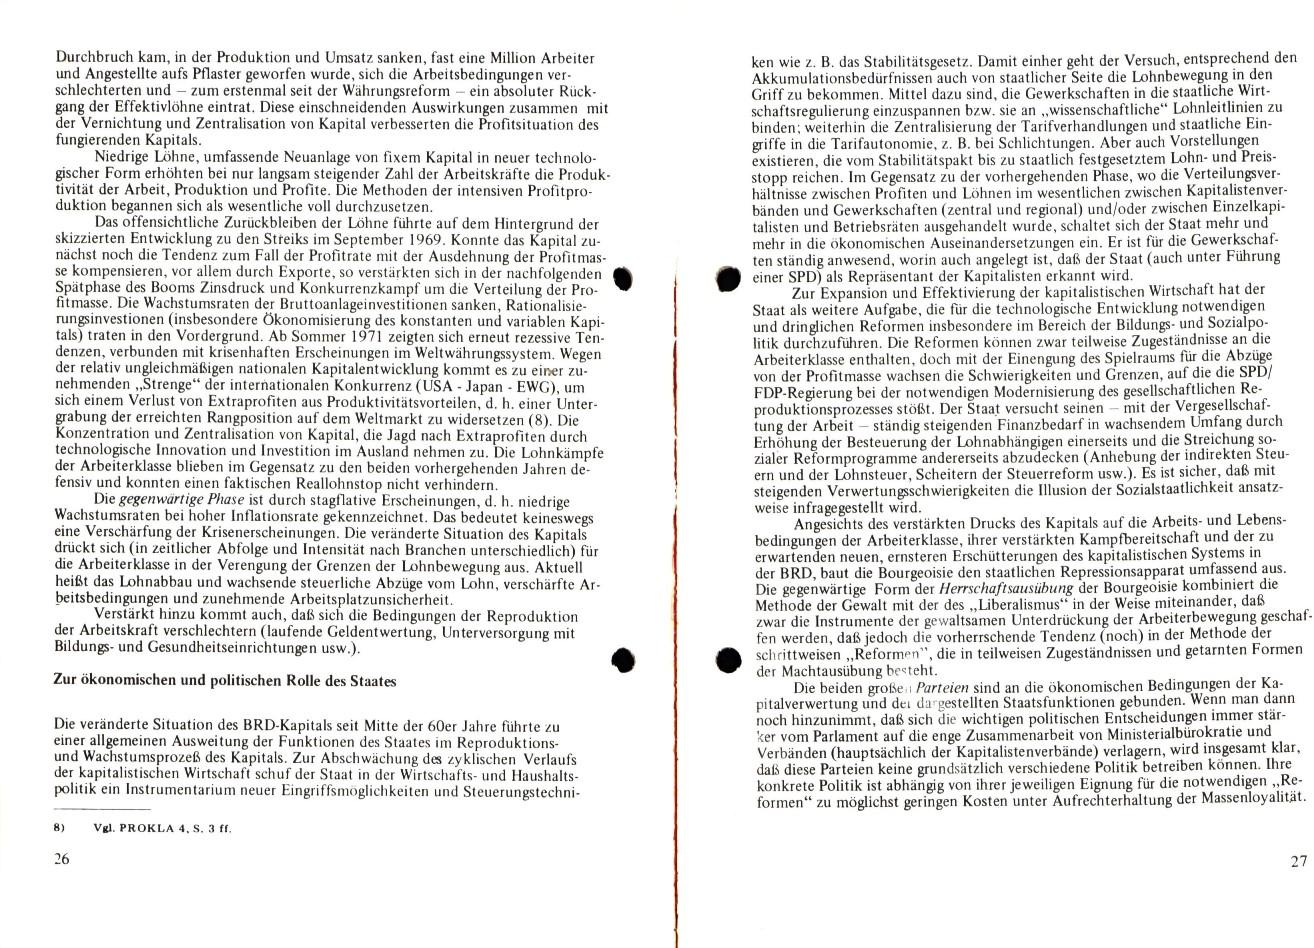 Berlin_KBML_Kommunist_1973_04s_15